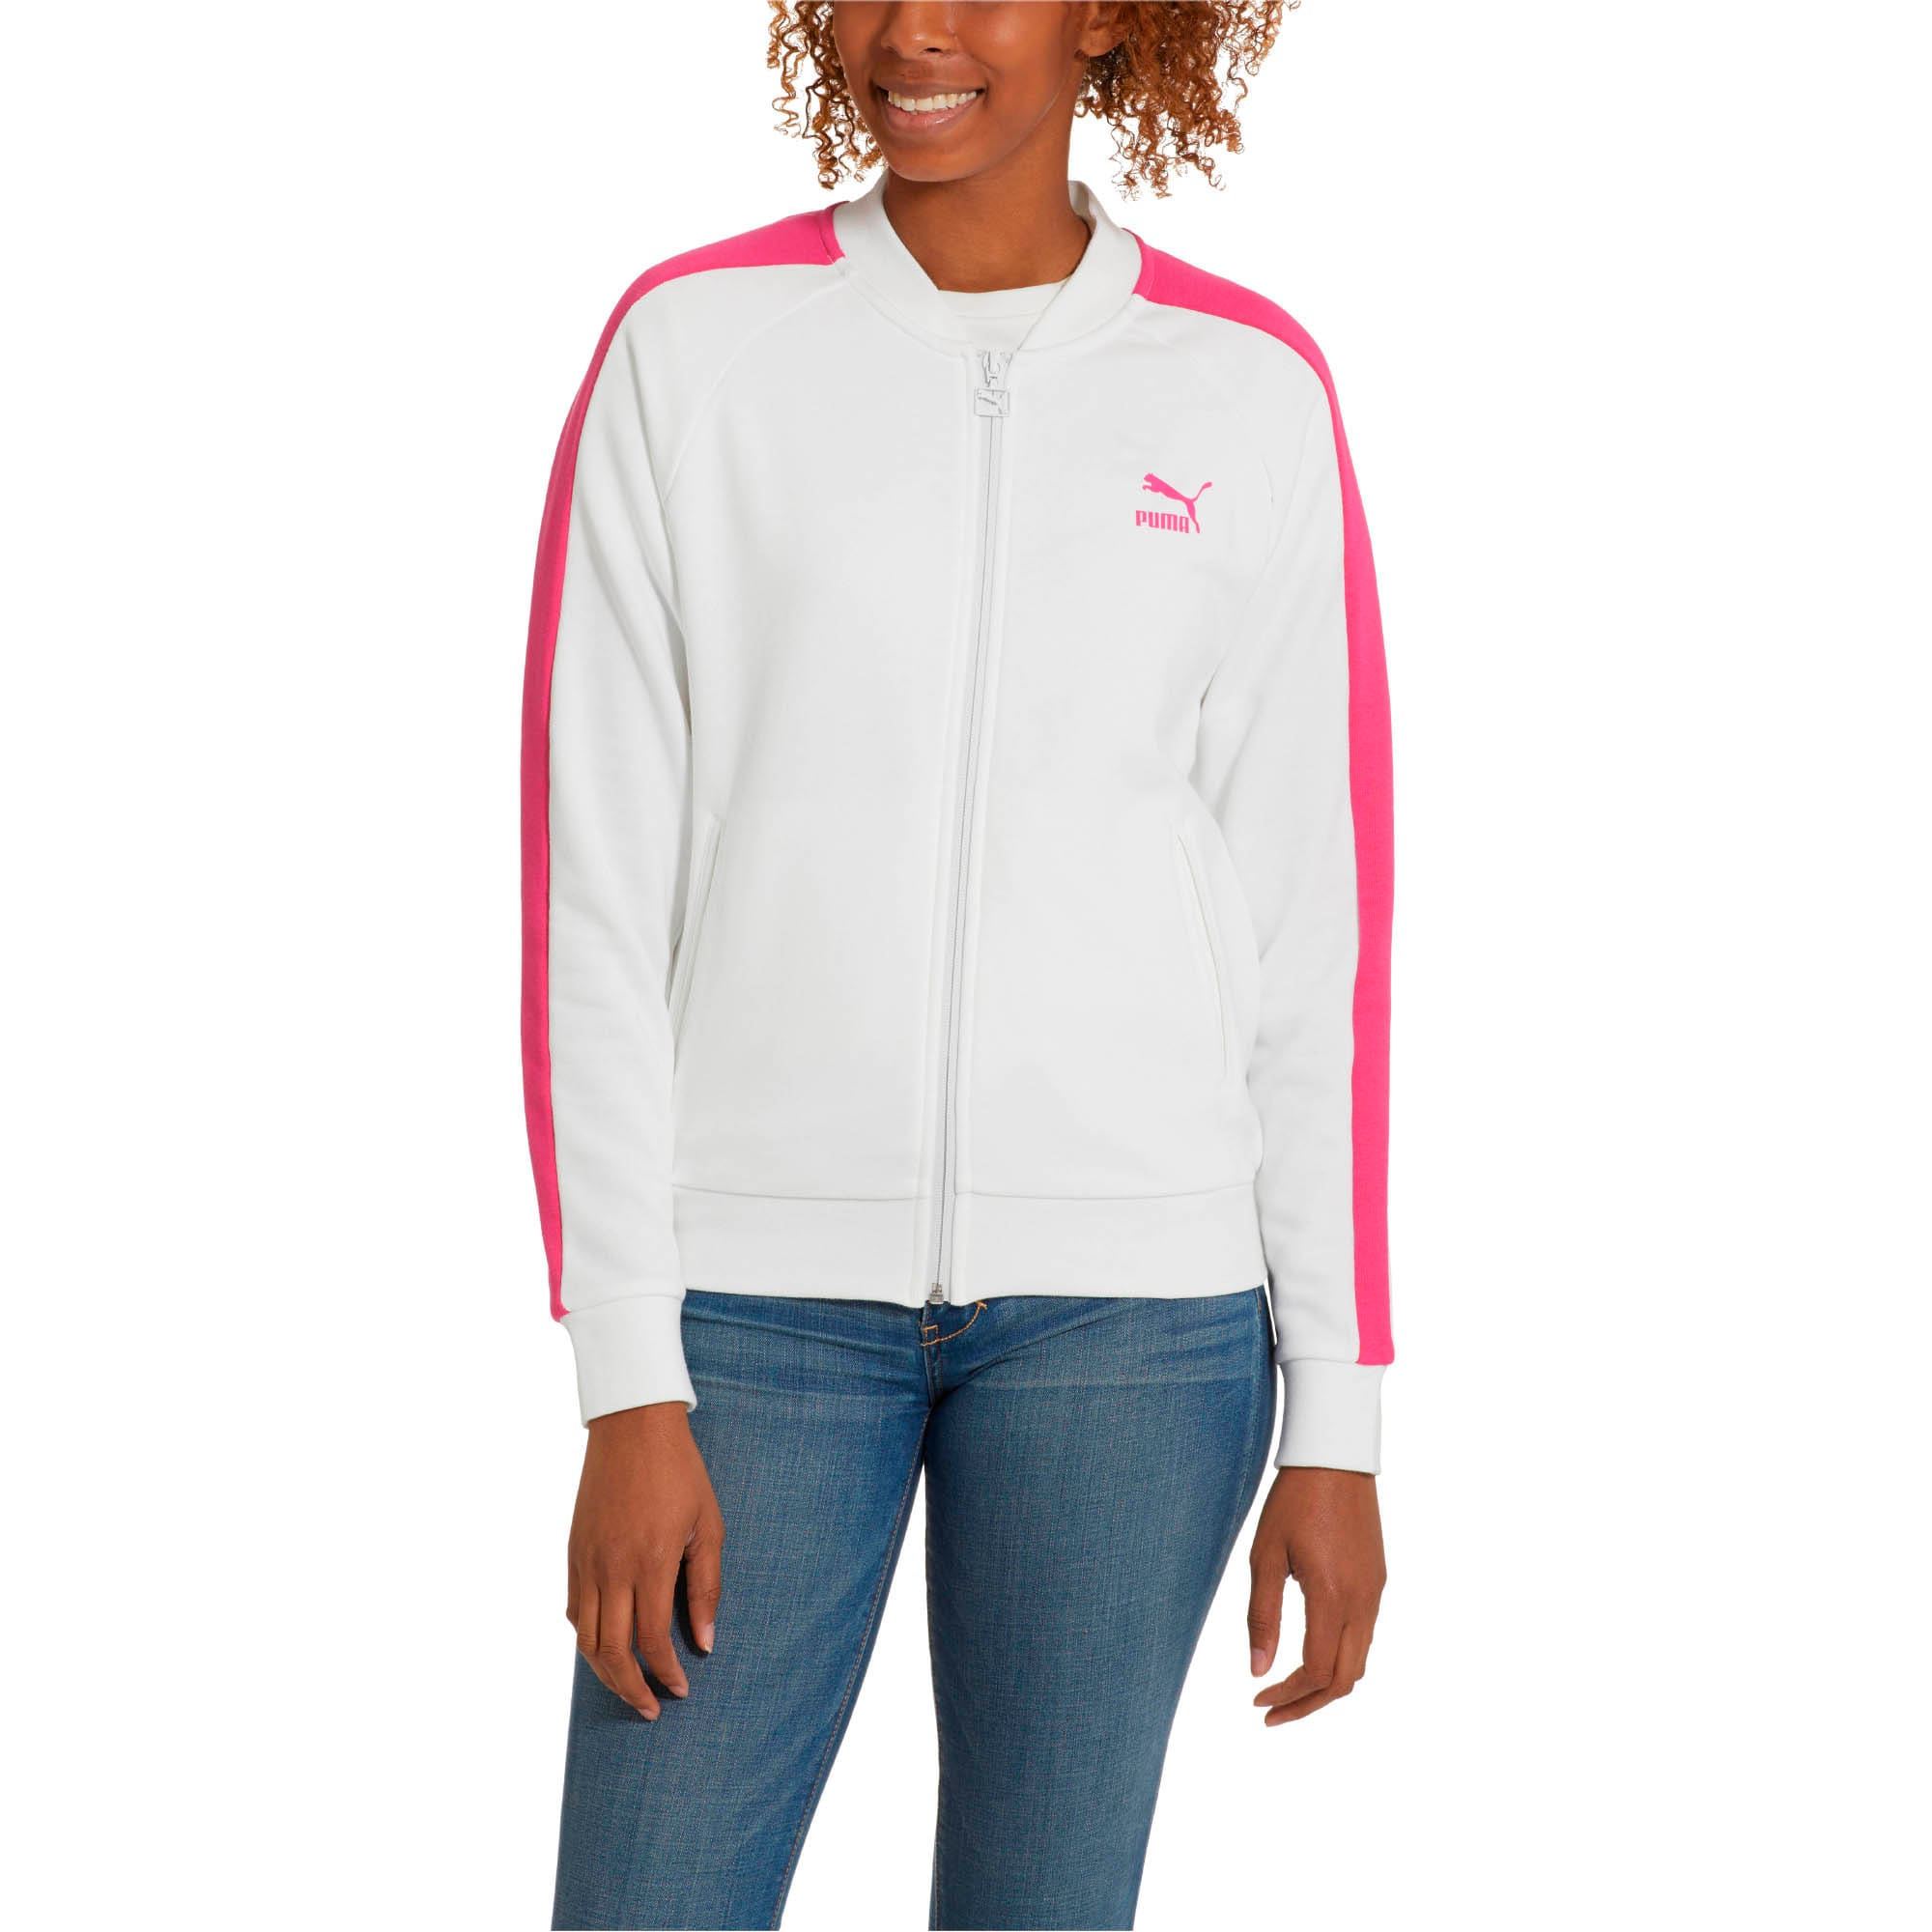 Thumbnail 2 of Classics Women's T7 Track Jacket, Puma White -1, medium